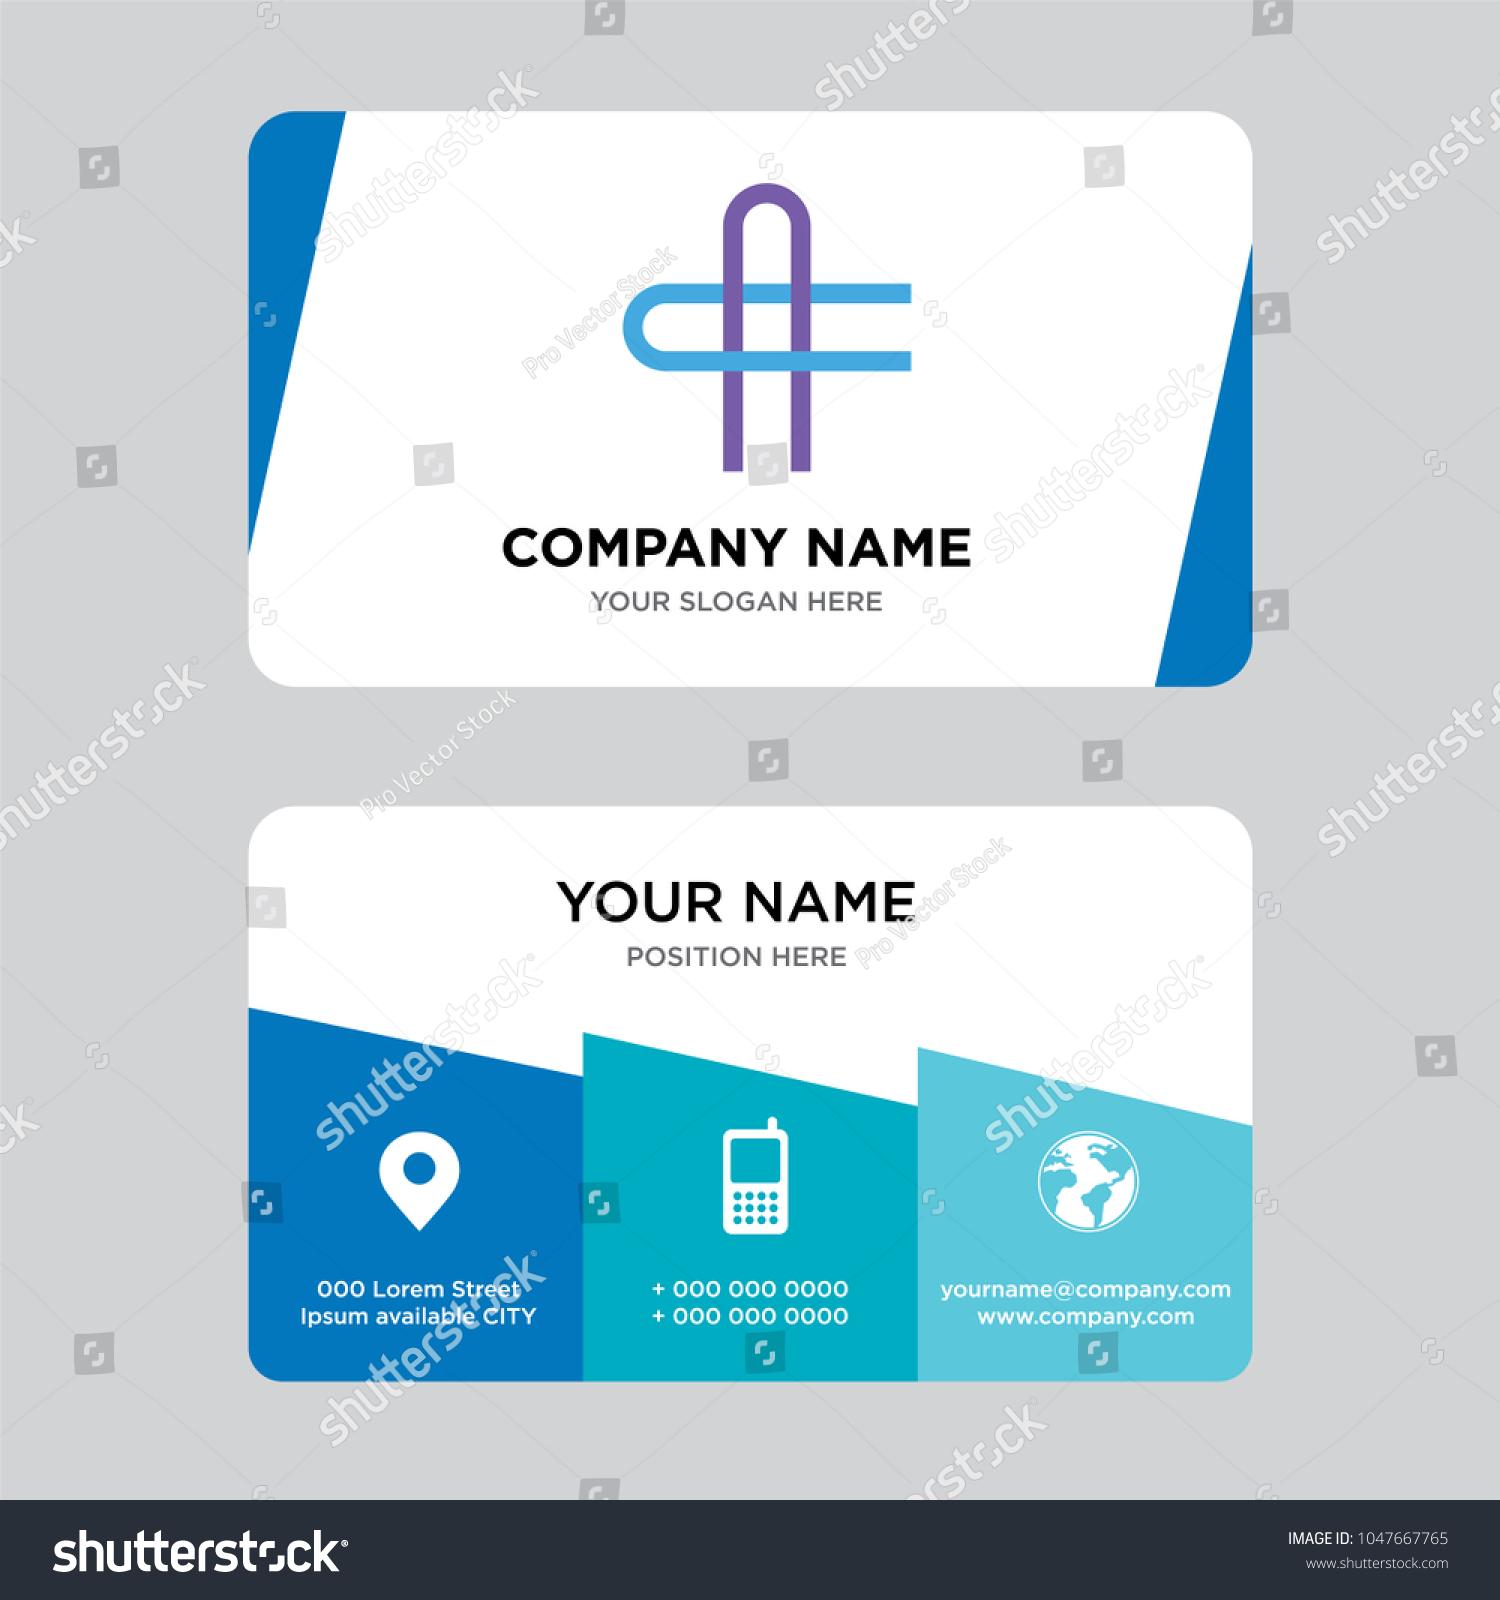 AC CA Letter Business Card Design Stock Vector 1047667765 - Shutterstock